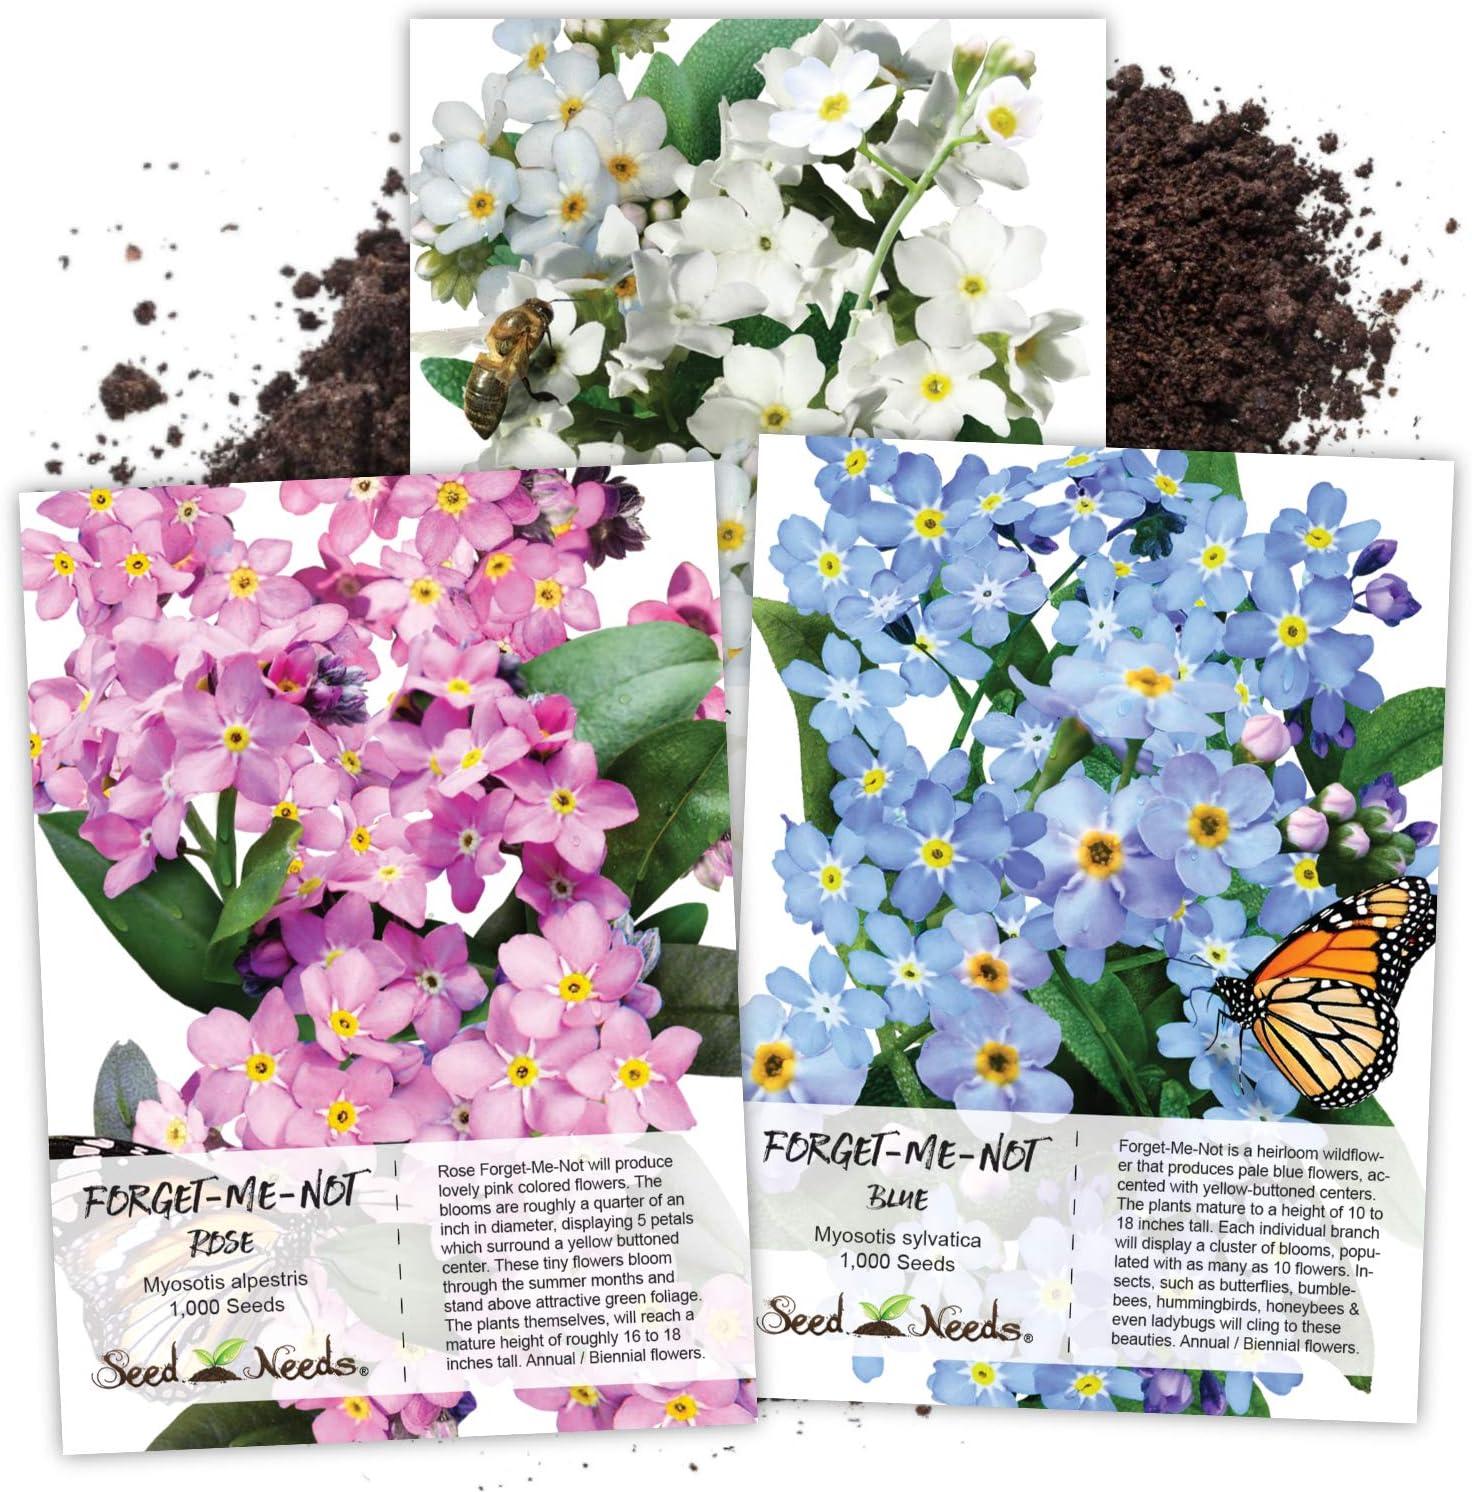 New life Seed Needs Heirloom Forget-Me-Not Collecti Flower Myosotis Spasm price